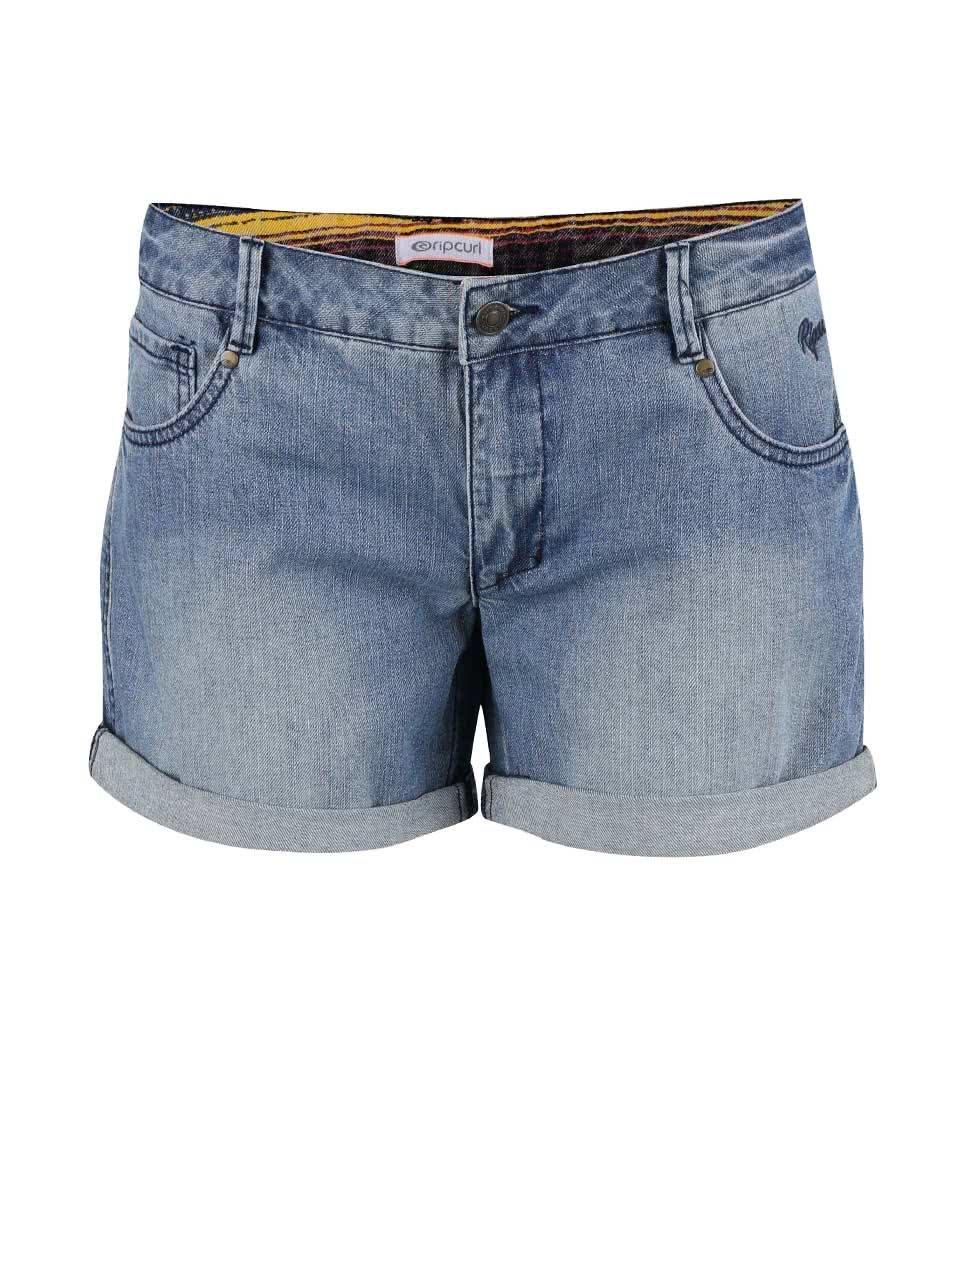 Modré dámské džínové kraťasy Rip Curl Cholla